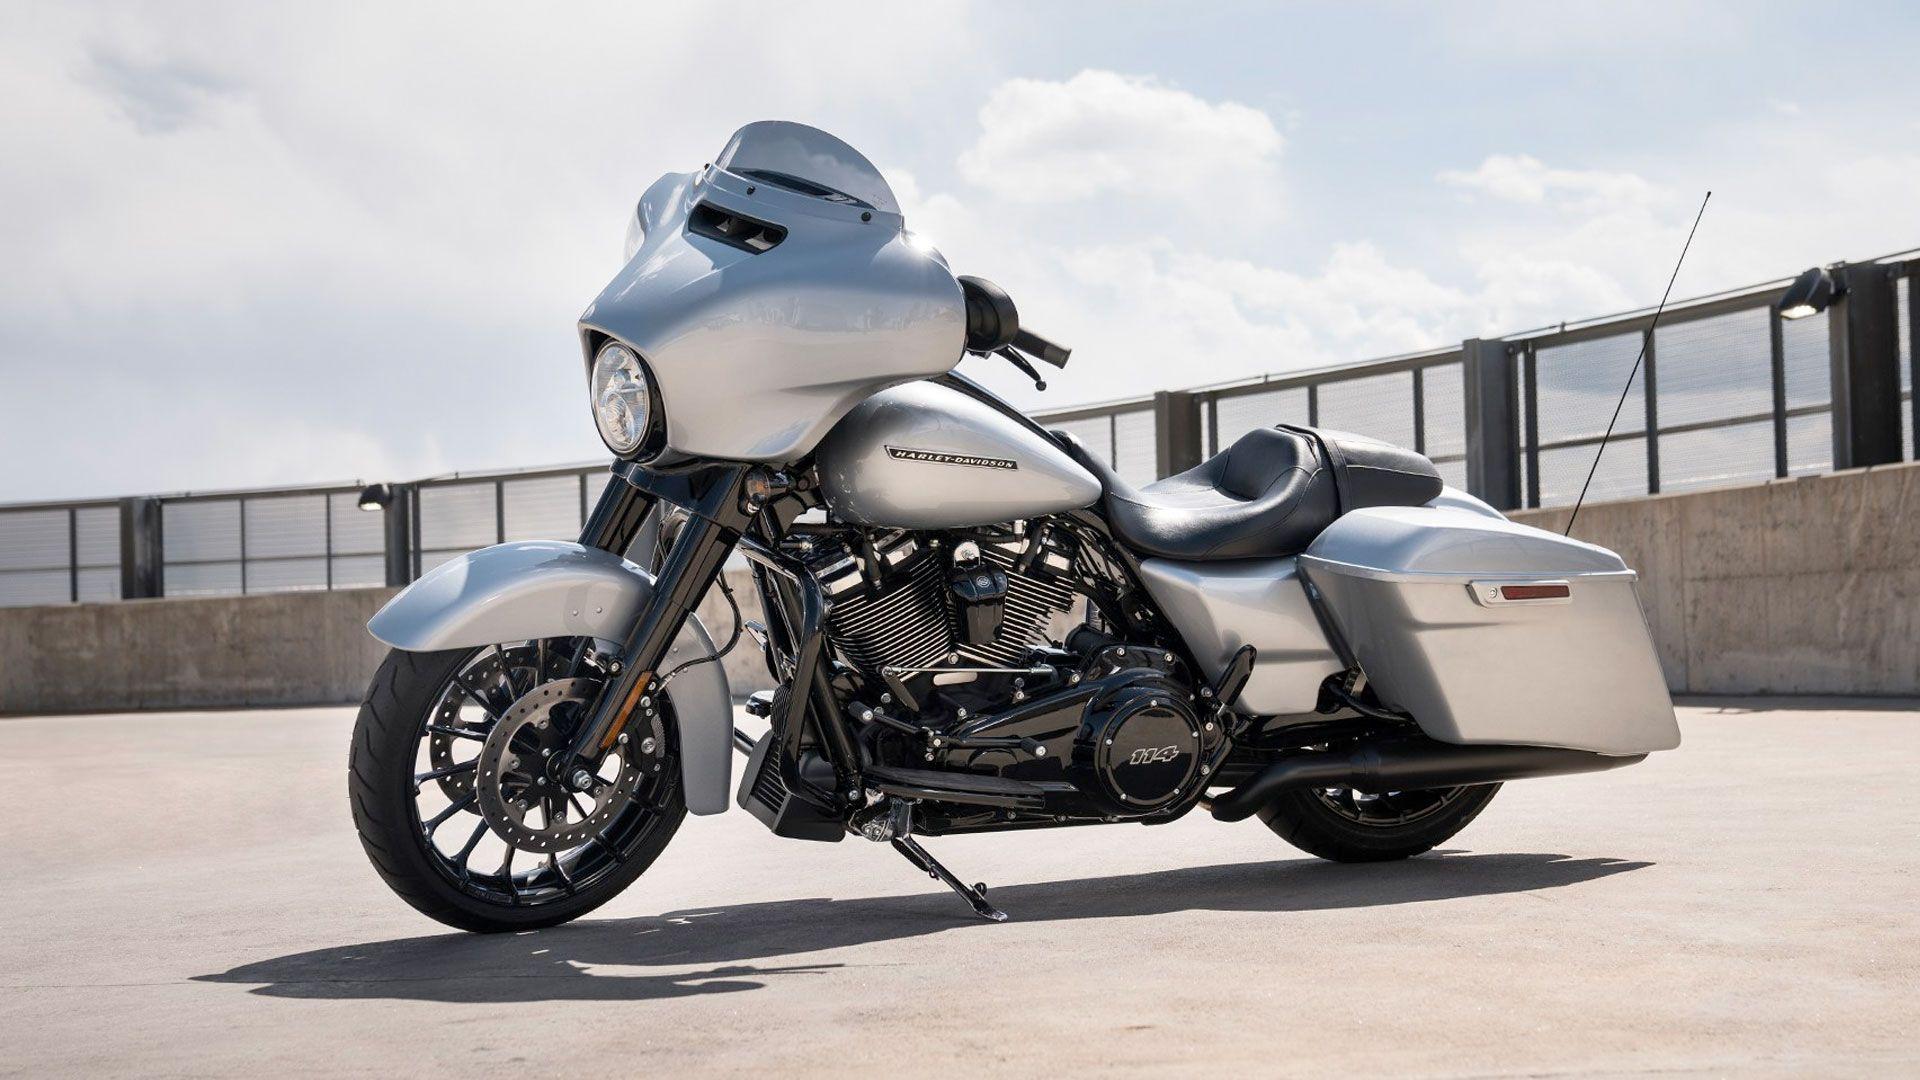 Street Glide Special 2019 Motorcycles Harley Davidson Banjara